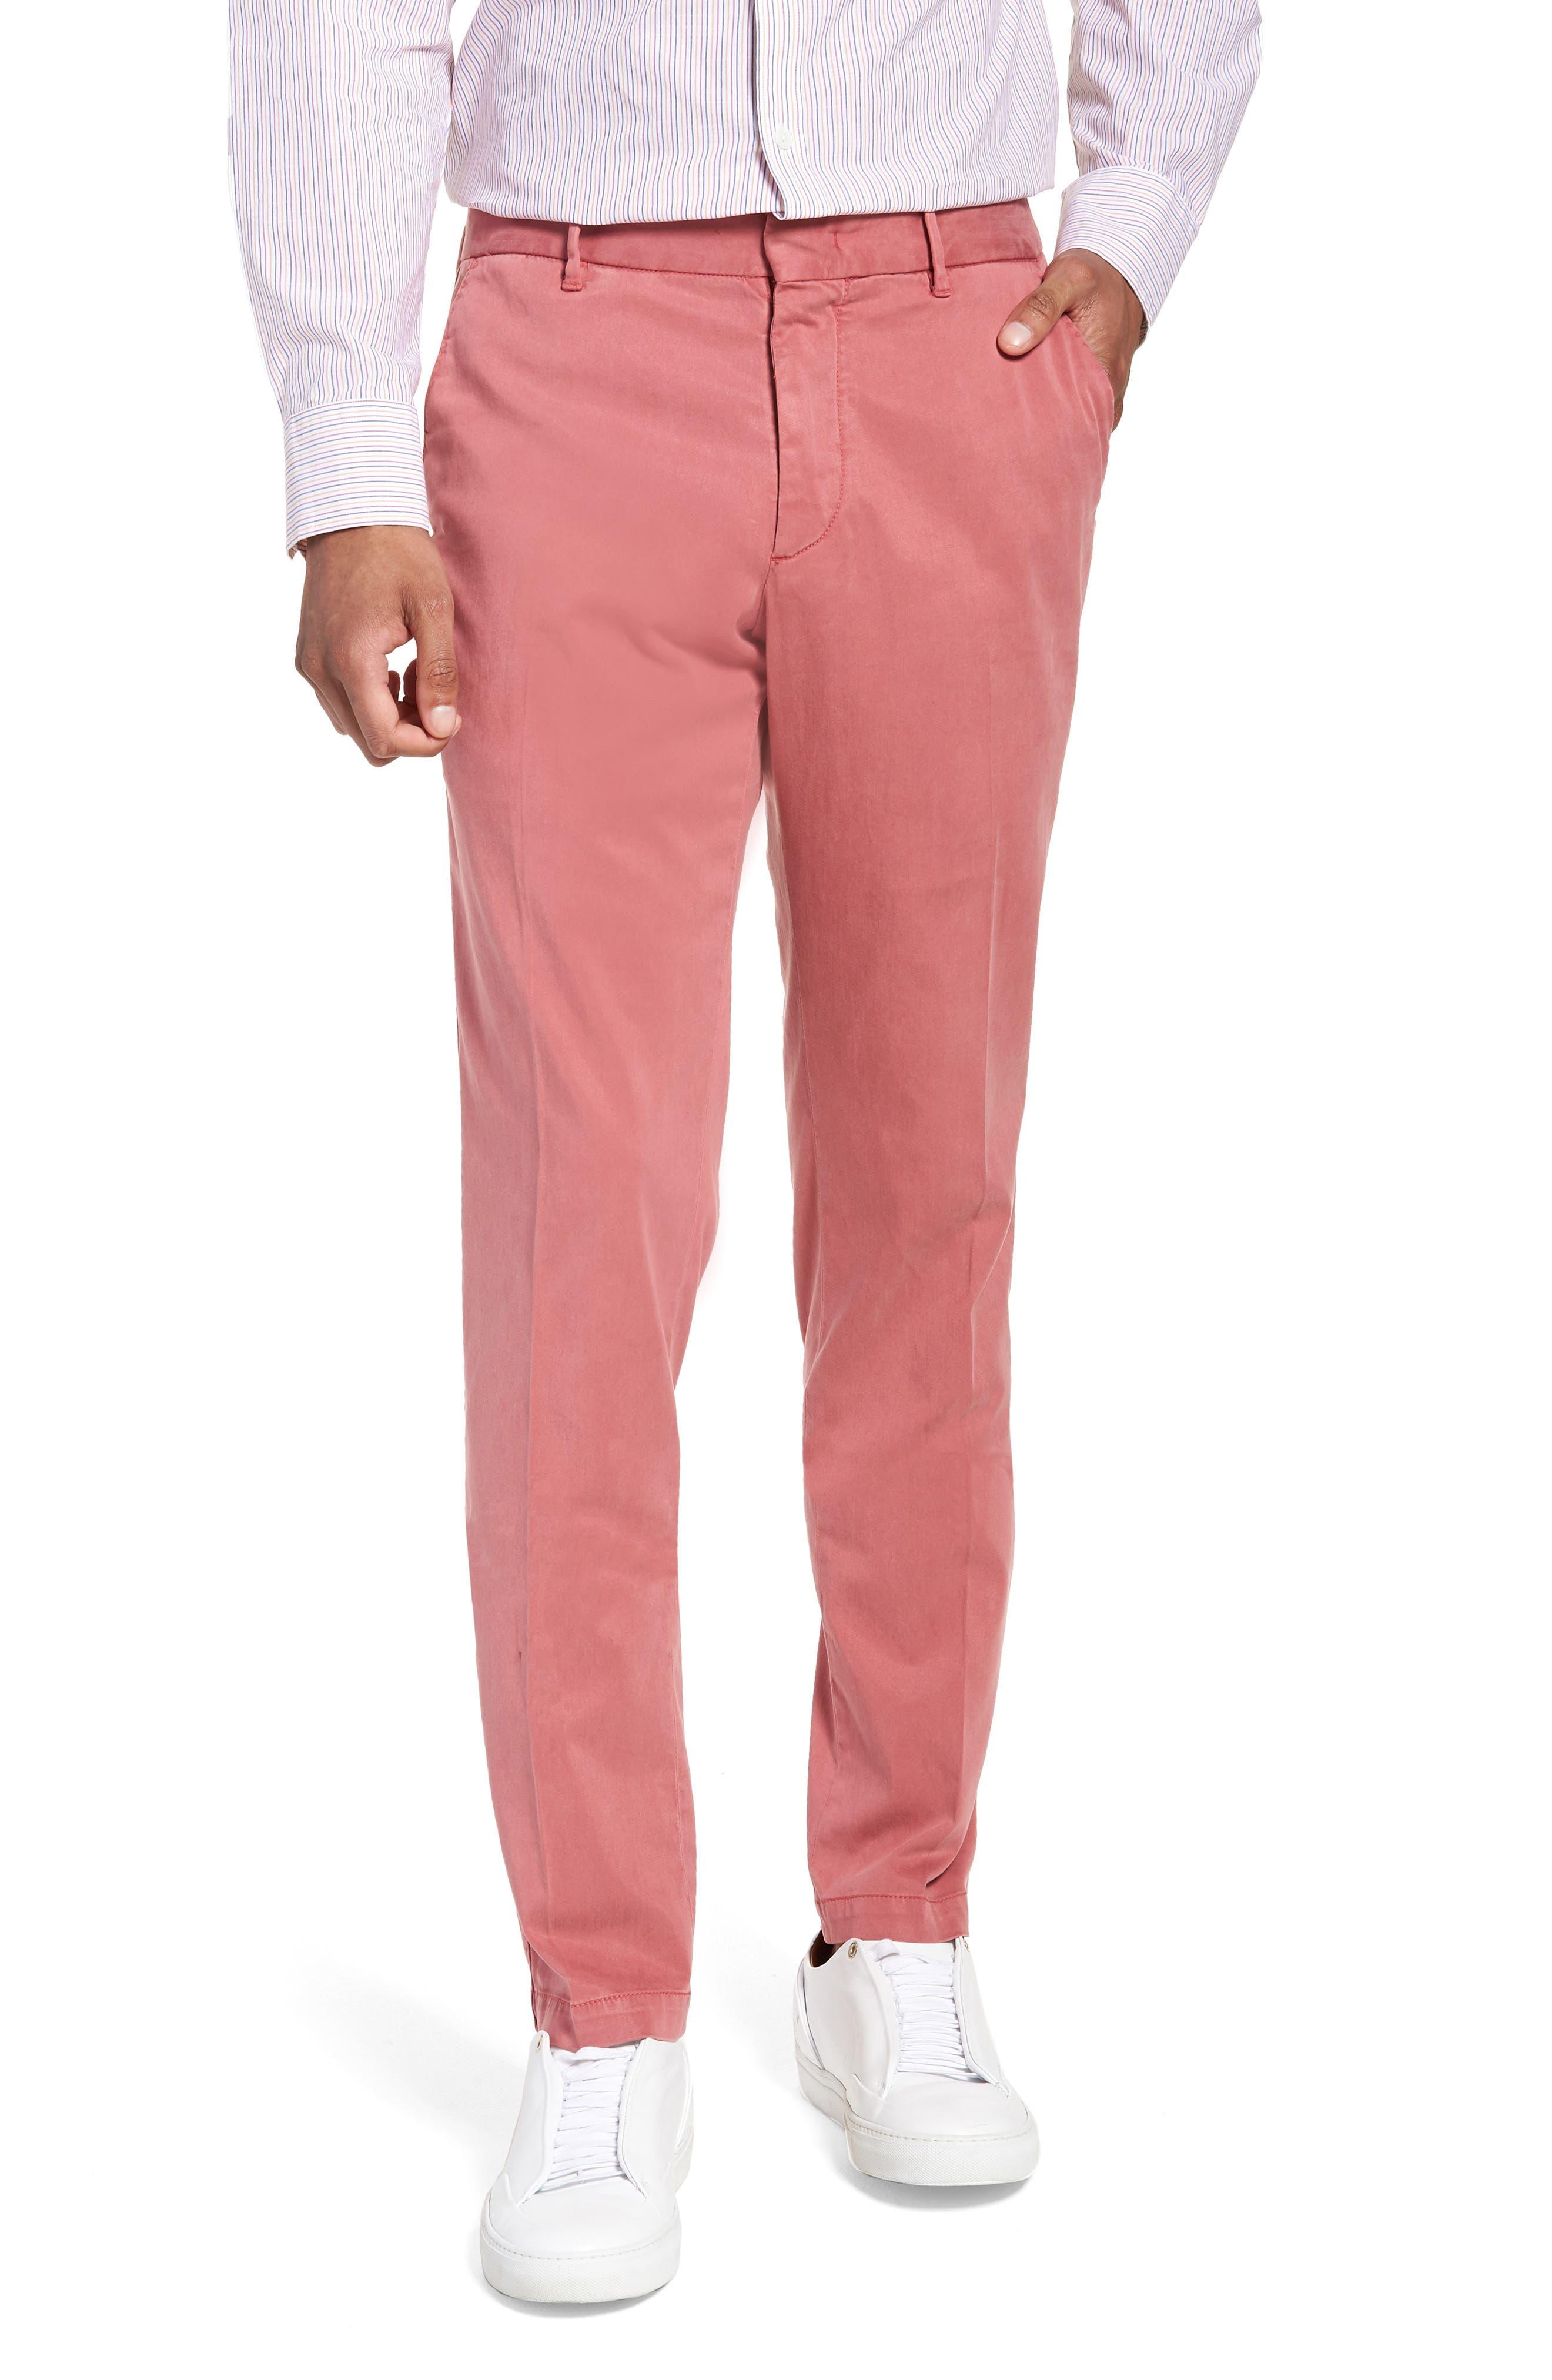 Aster Straight Fit Pants,                             Main thumbnail 1, color,                             Pink